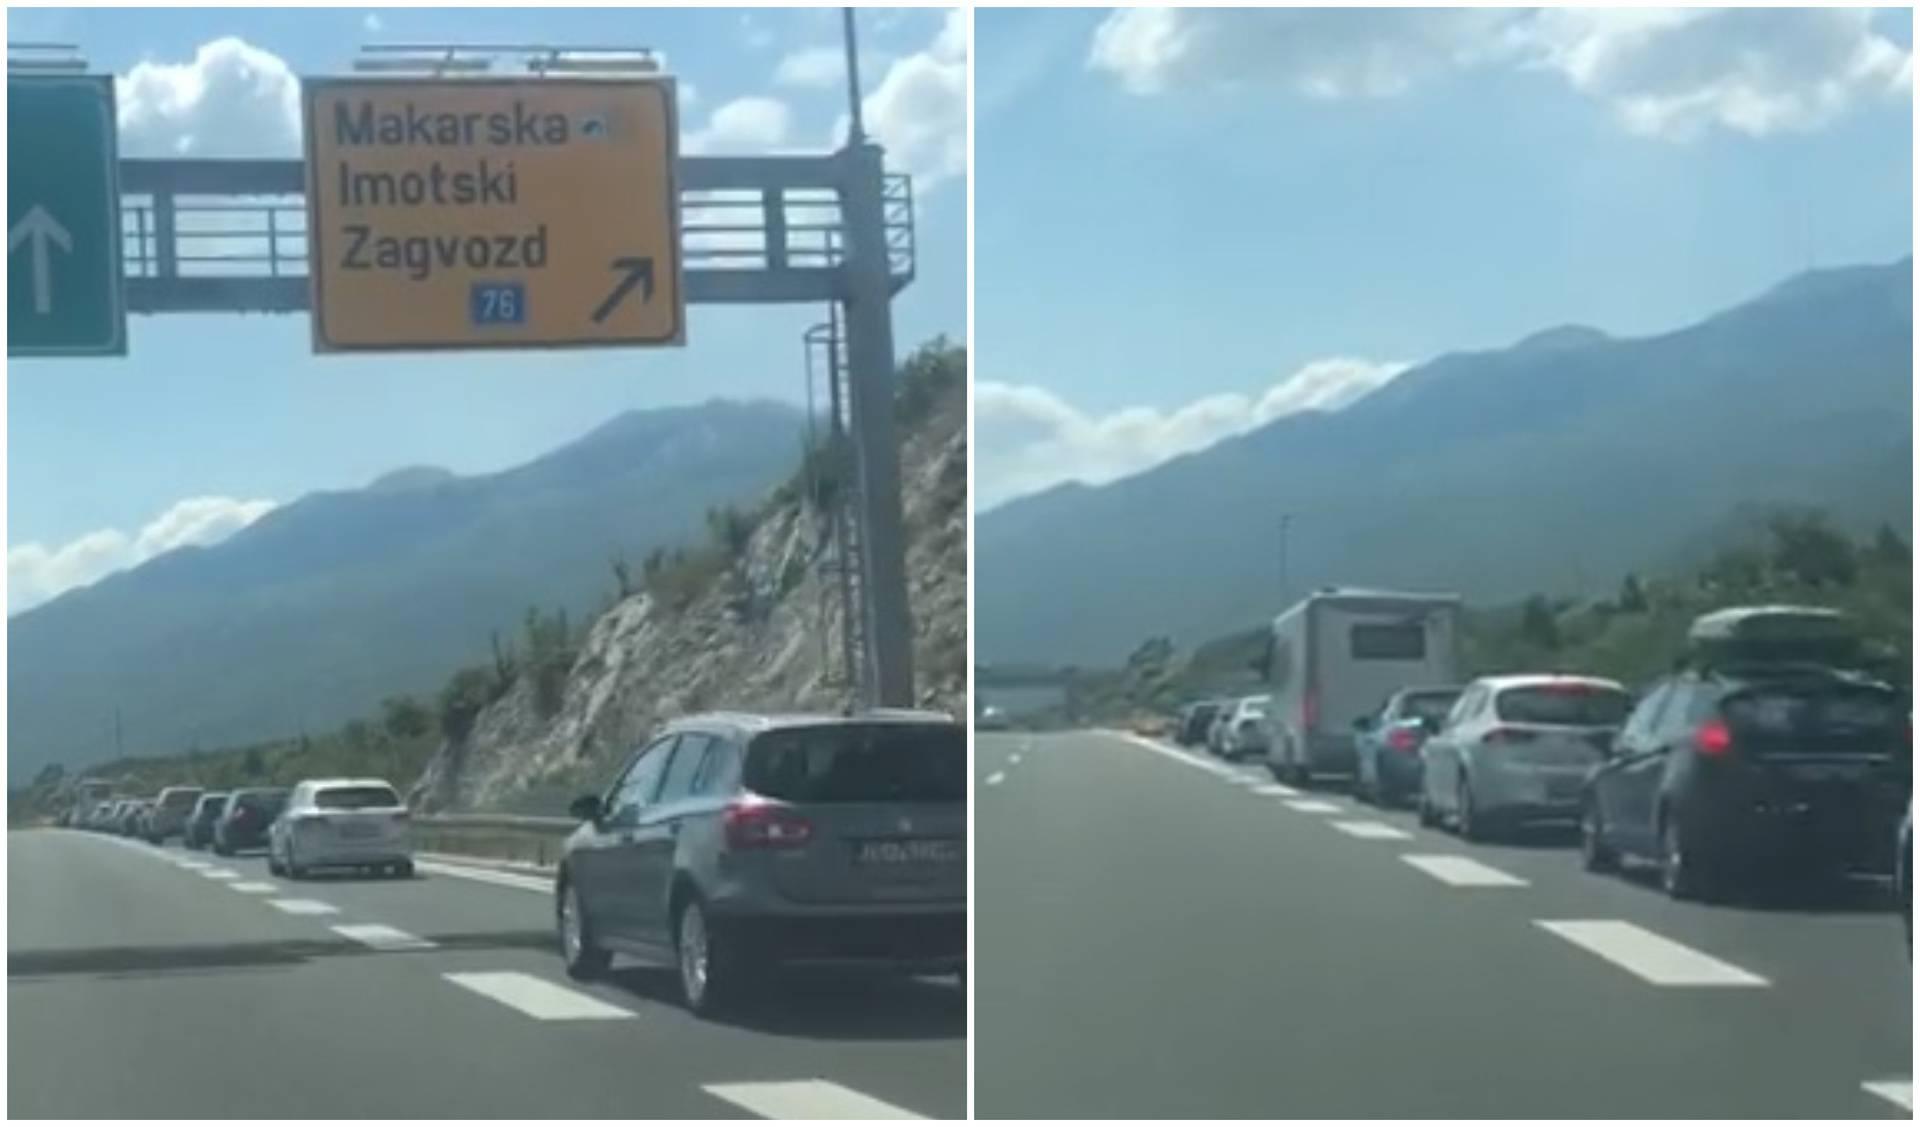 Špica sezone: Na autoputu kraj Makarske nastao 'gužvanac'